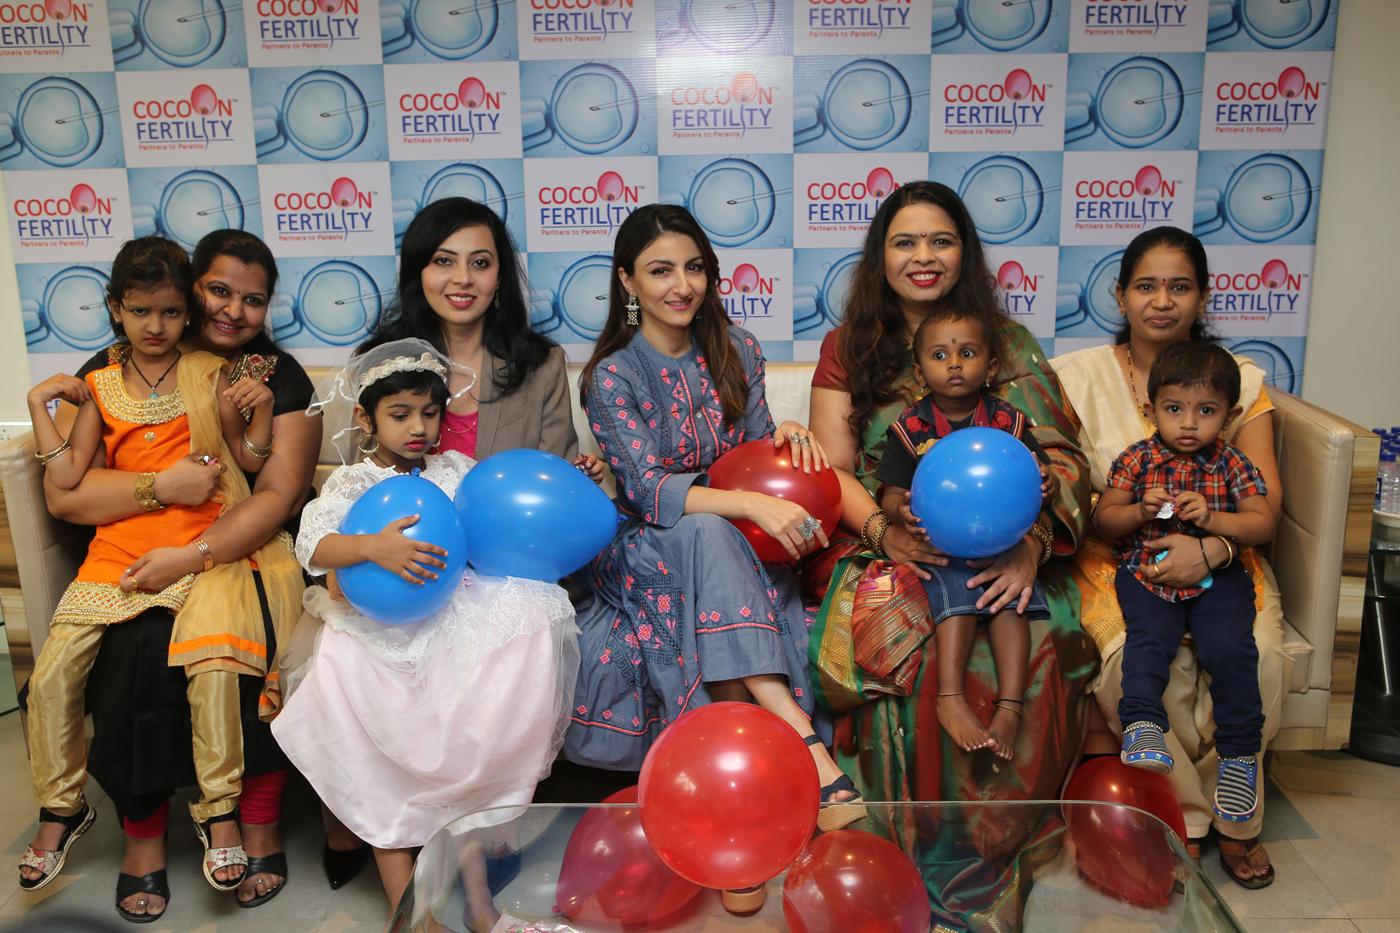 Dr Anagha Karkhanis, Soha Ali Khan, Dr Rajalaxmi Walavalkar with parents & their childern who were conceived through IVF at Cocoon Fertility Thane.jpg